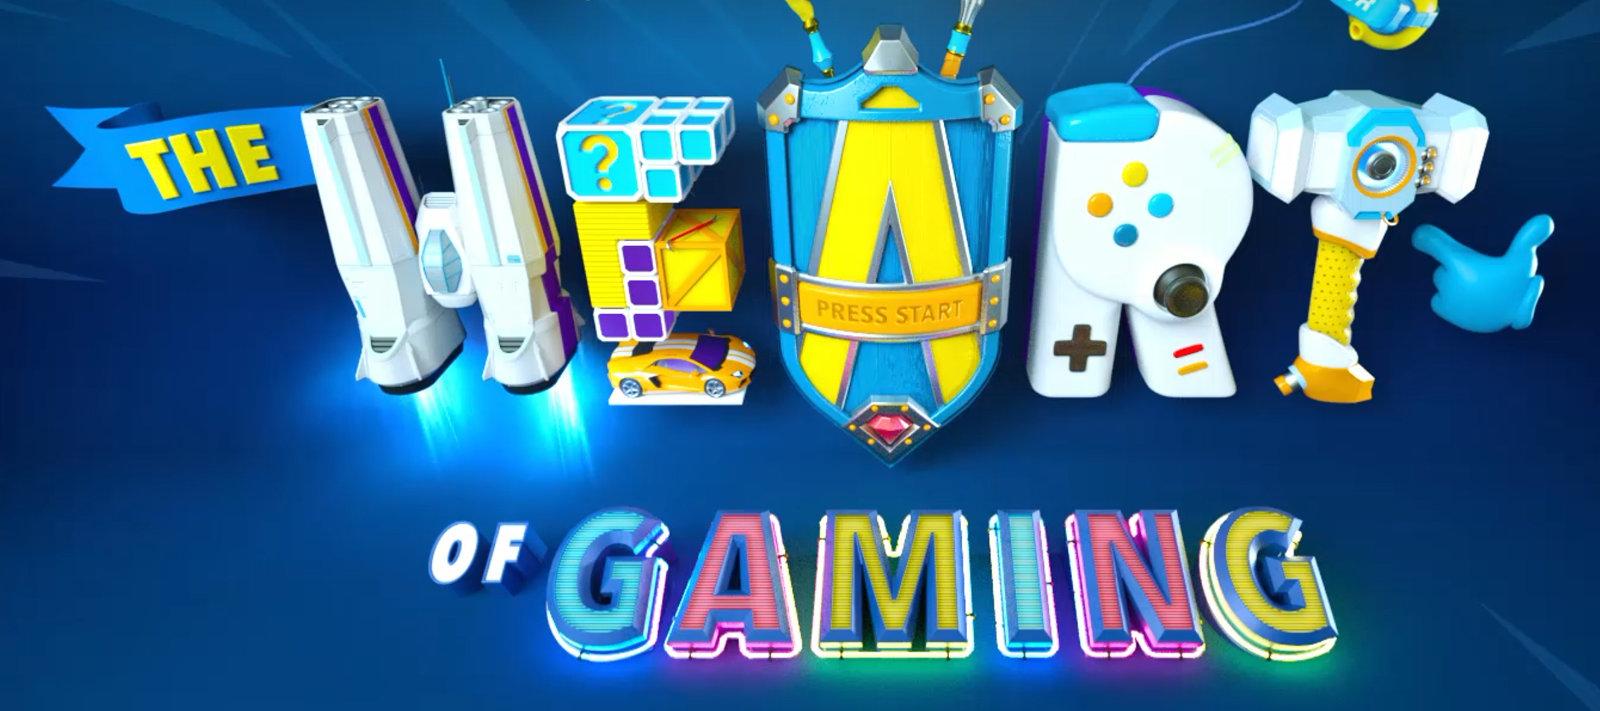 Gamescom Besucherzahlen 2021